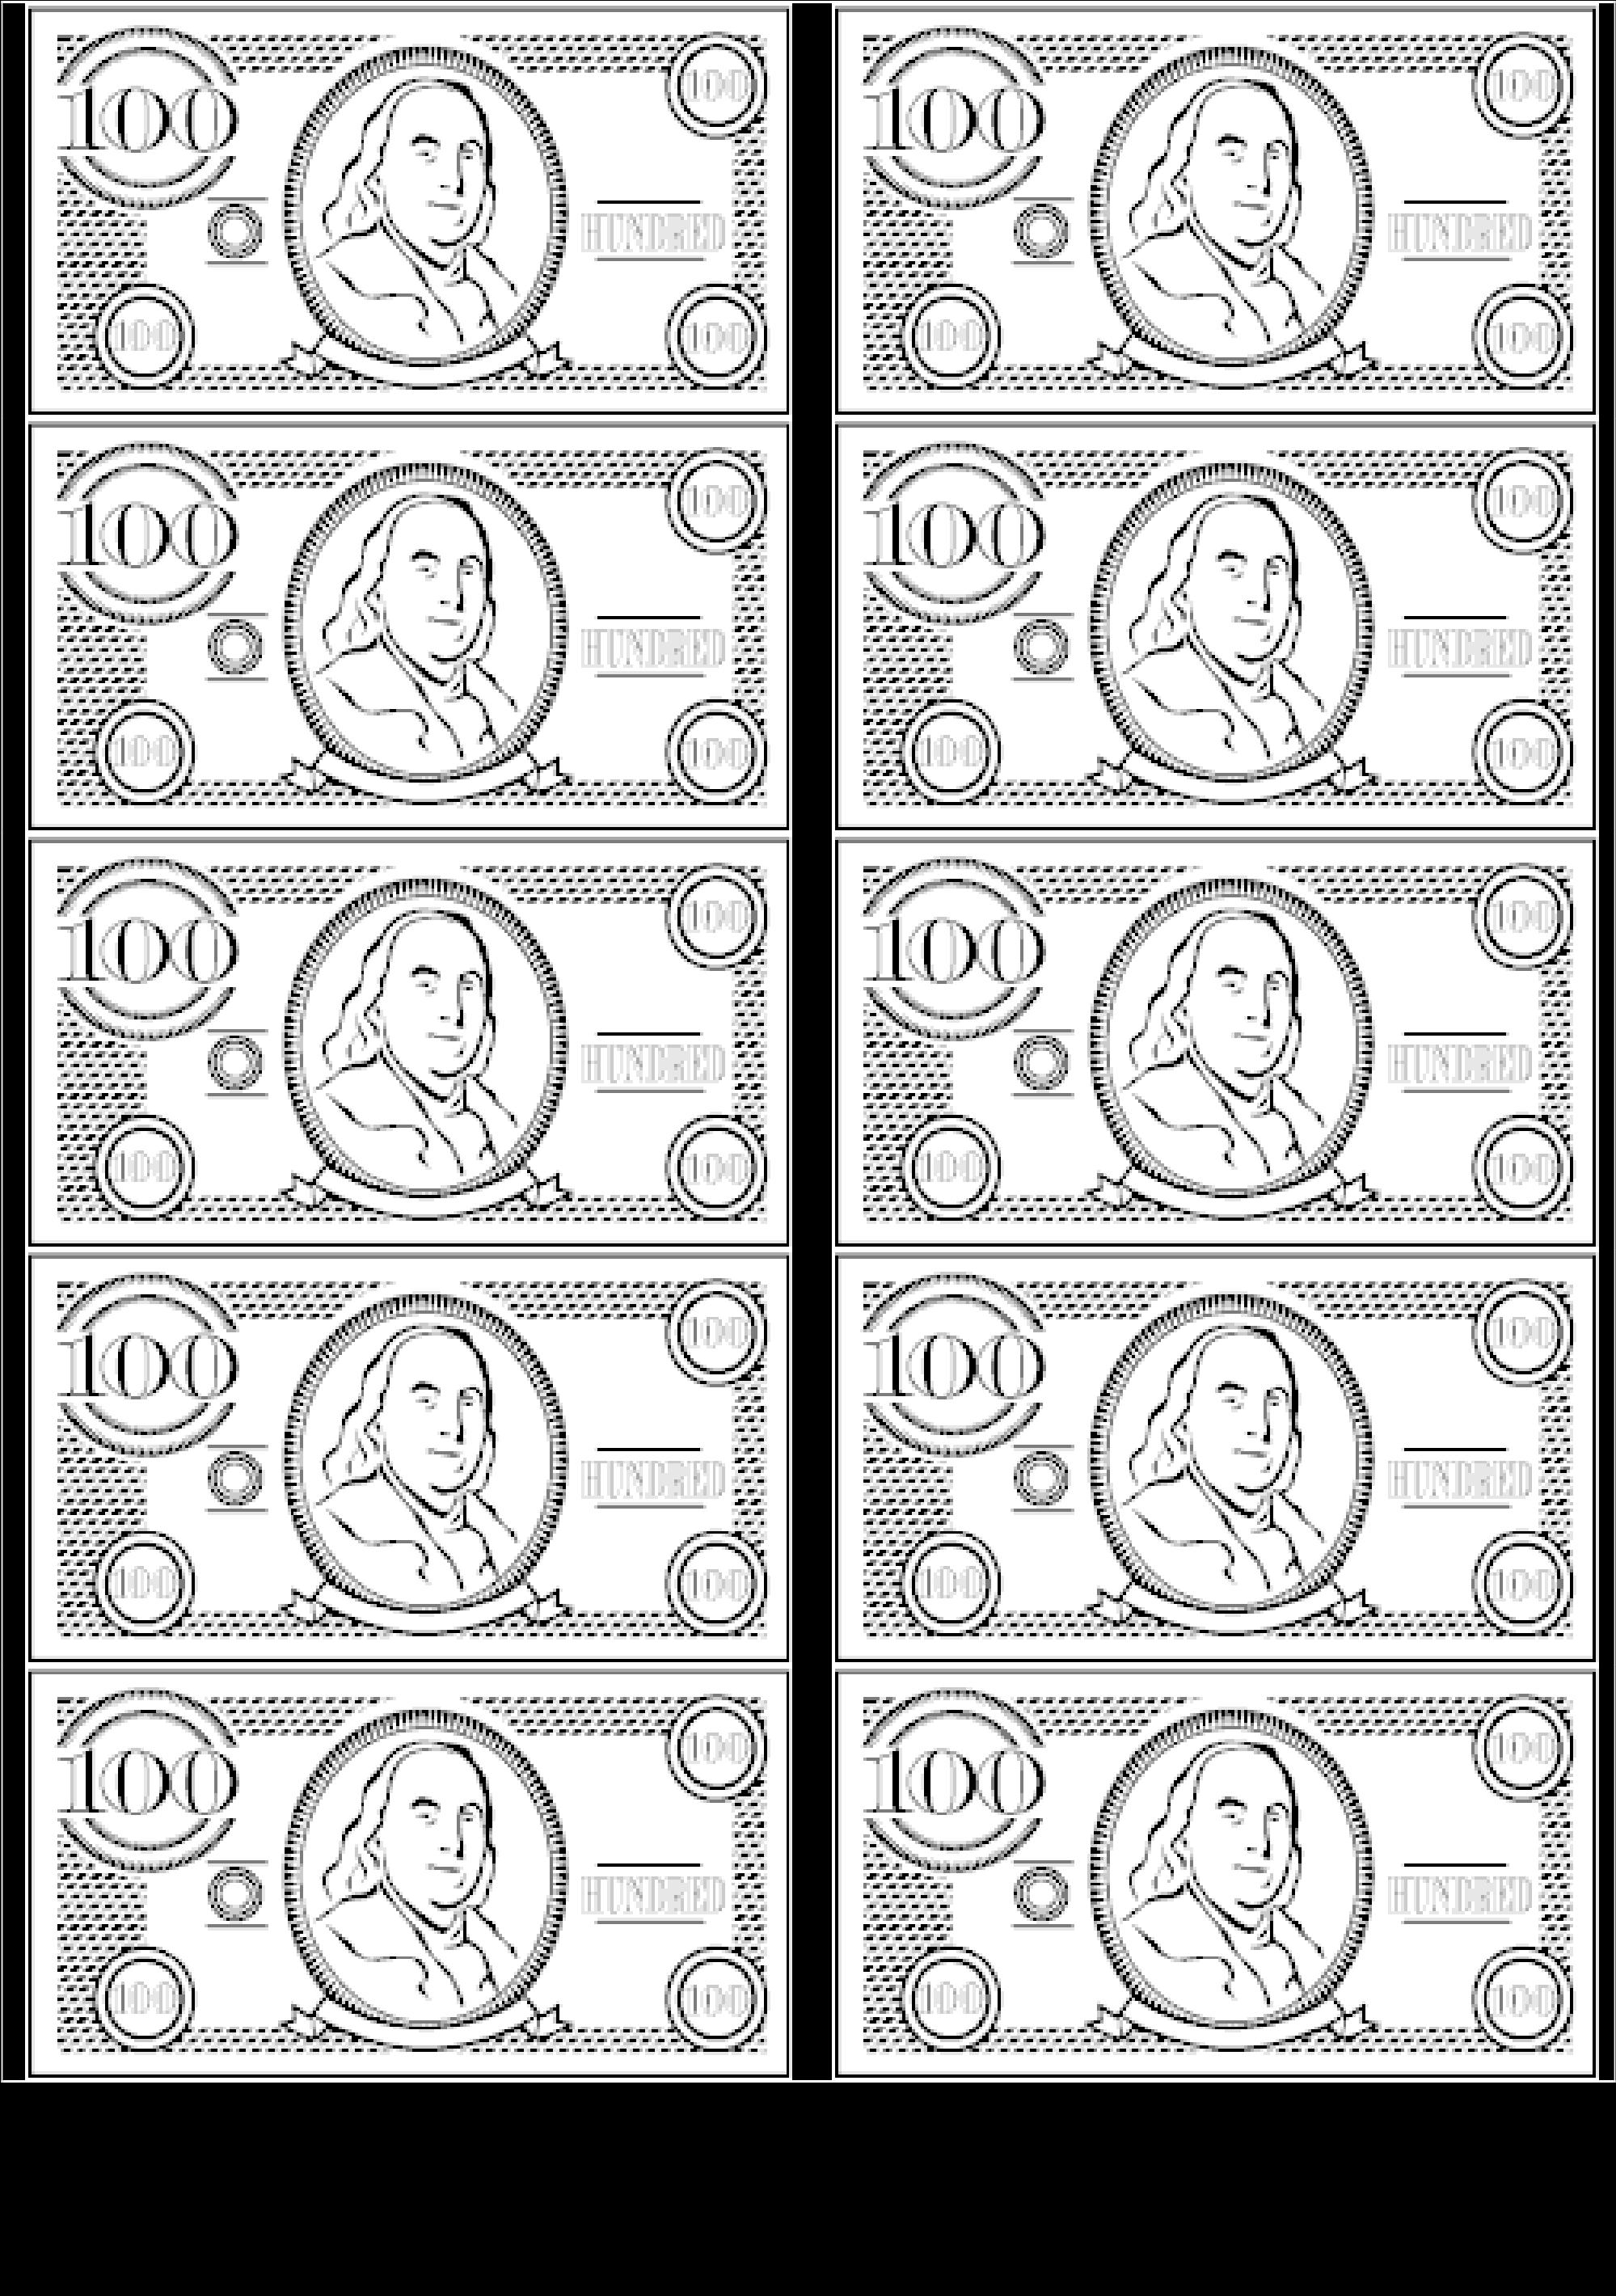 100 bill money image printable play